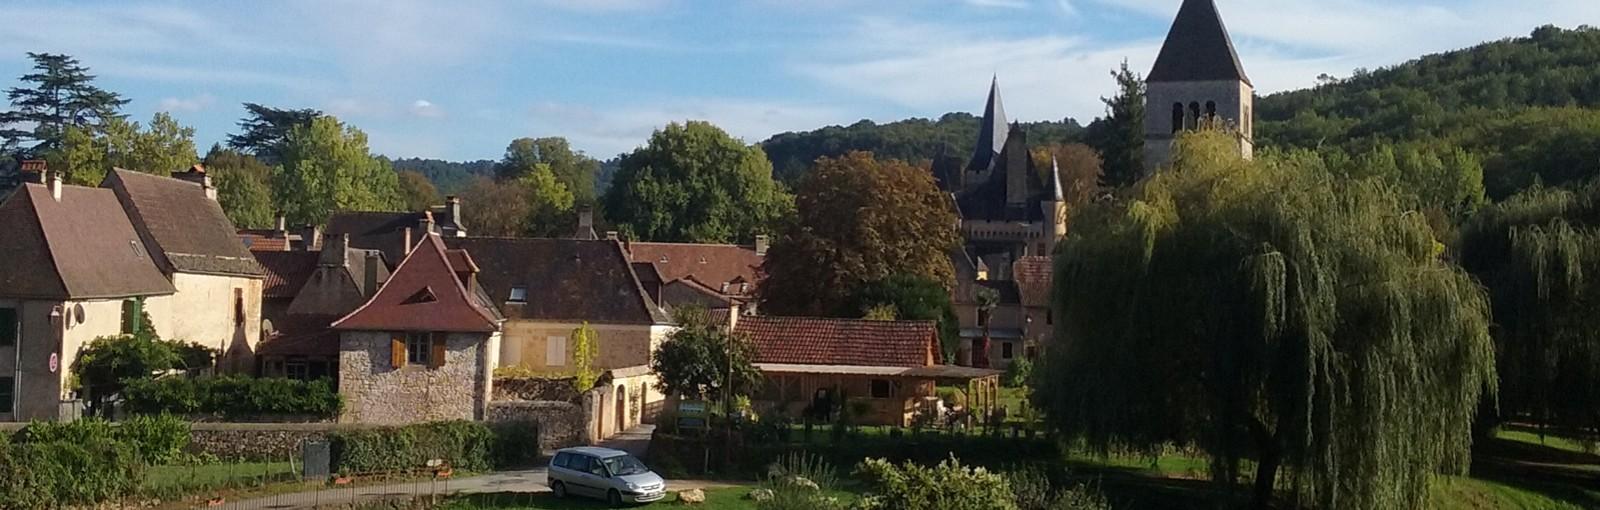 Tours Multi-days tours from Bordeaux or Sarlat - Dordoña y Burdeos - TOURS REGIONALES